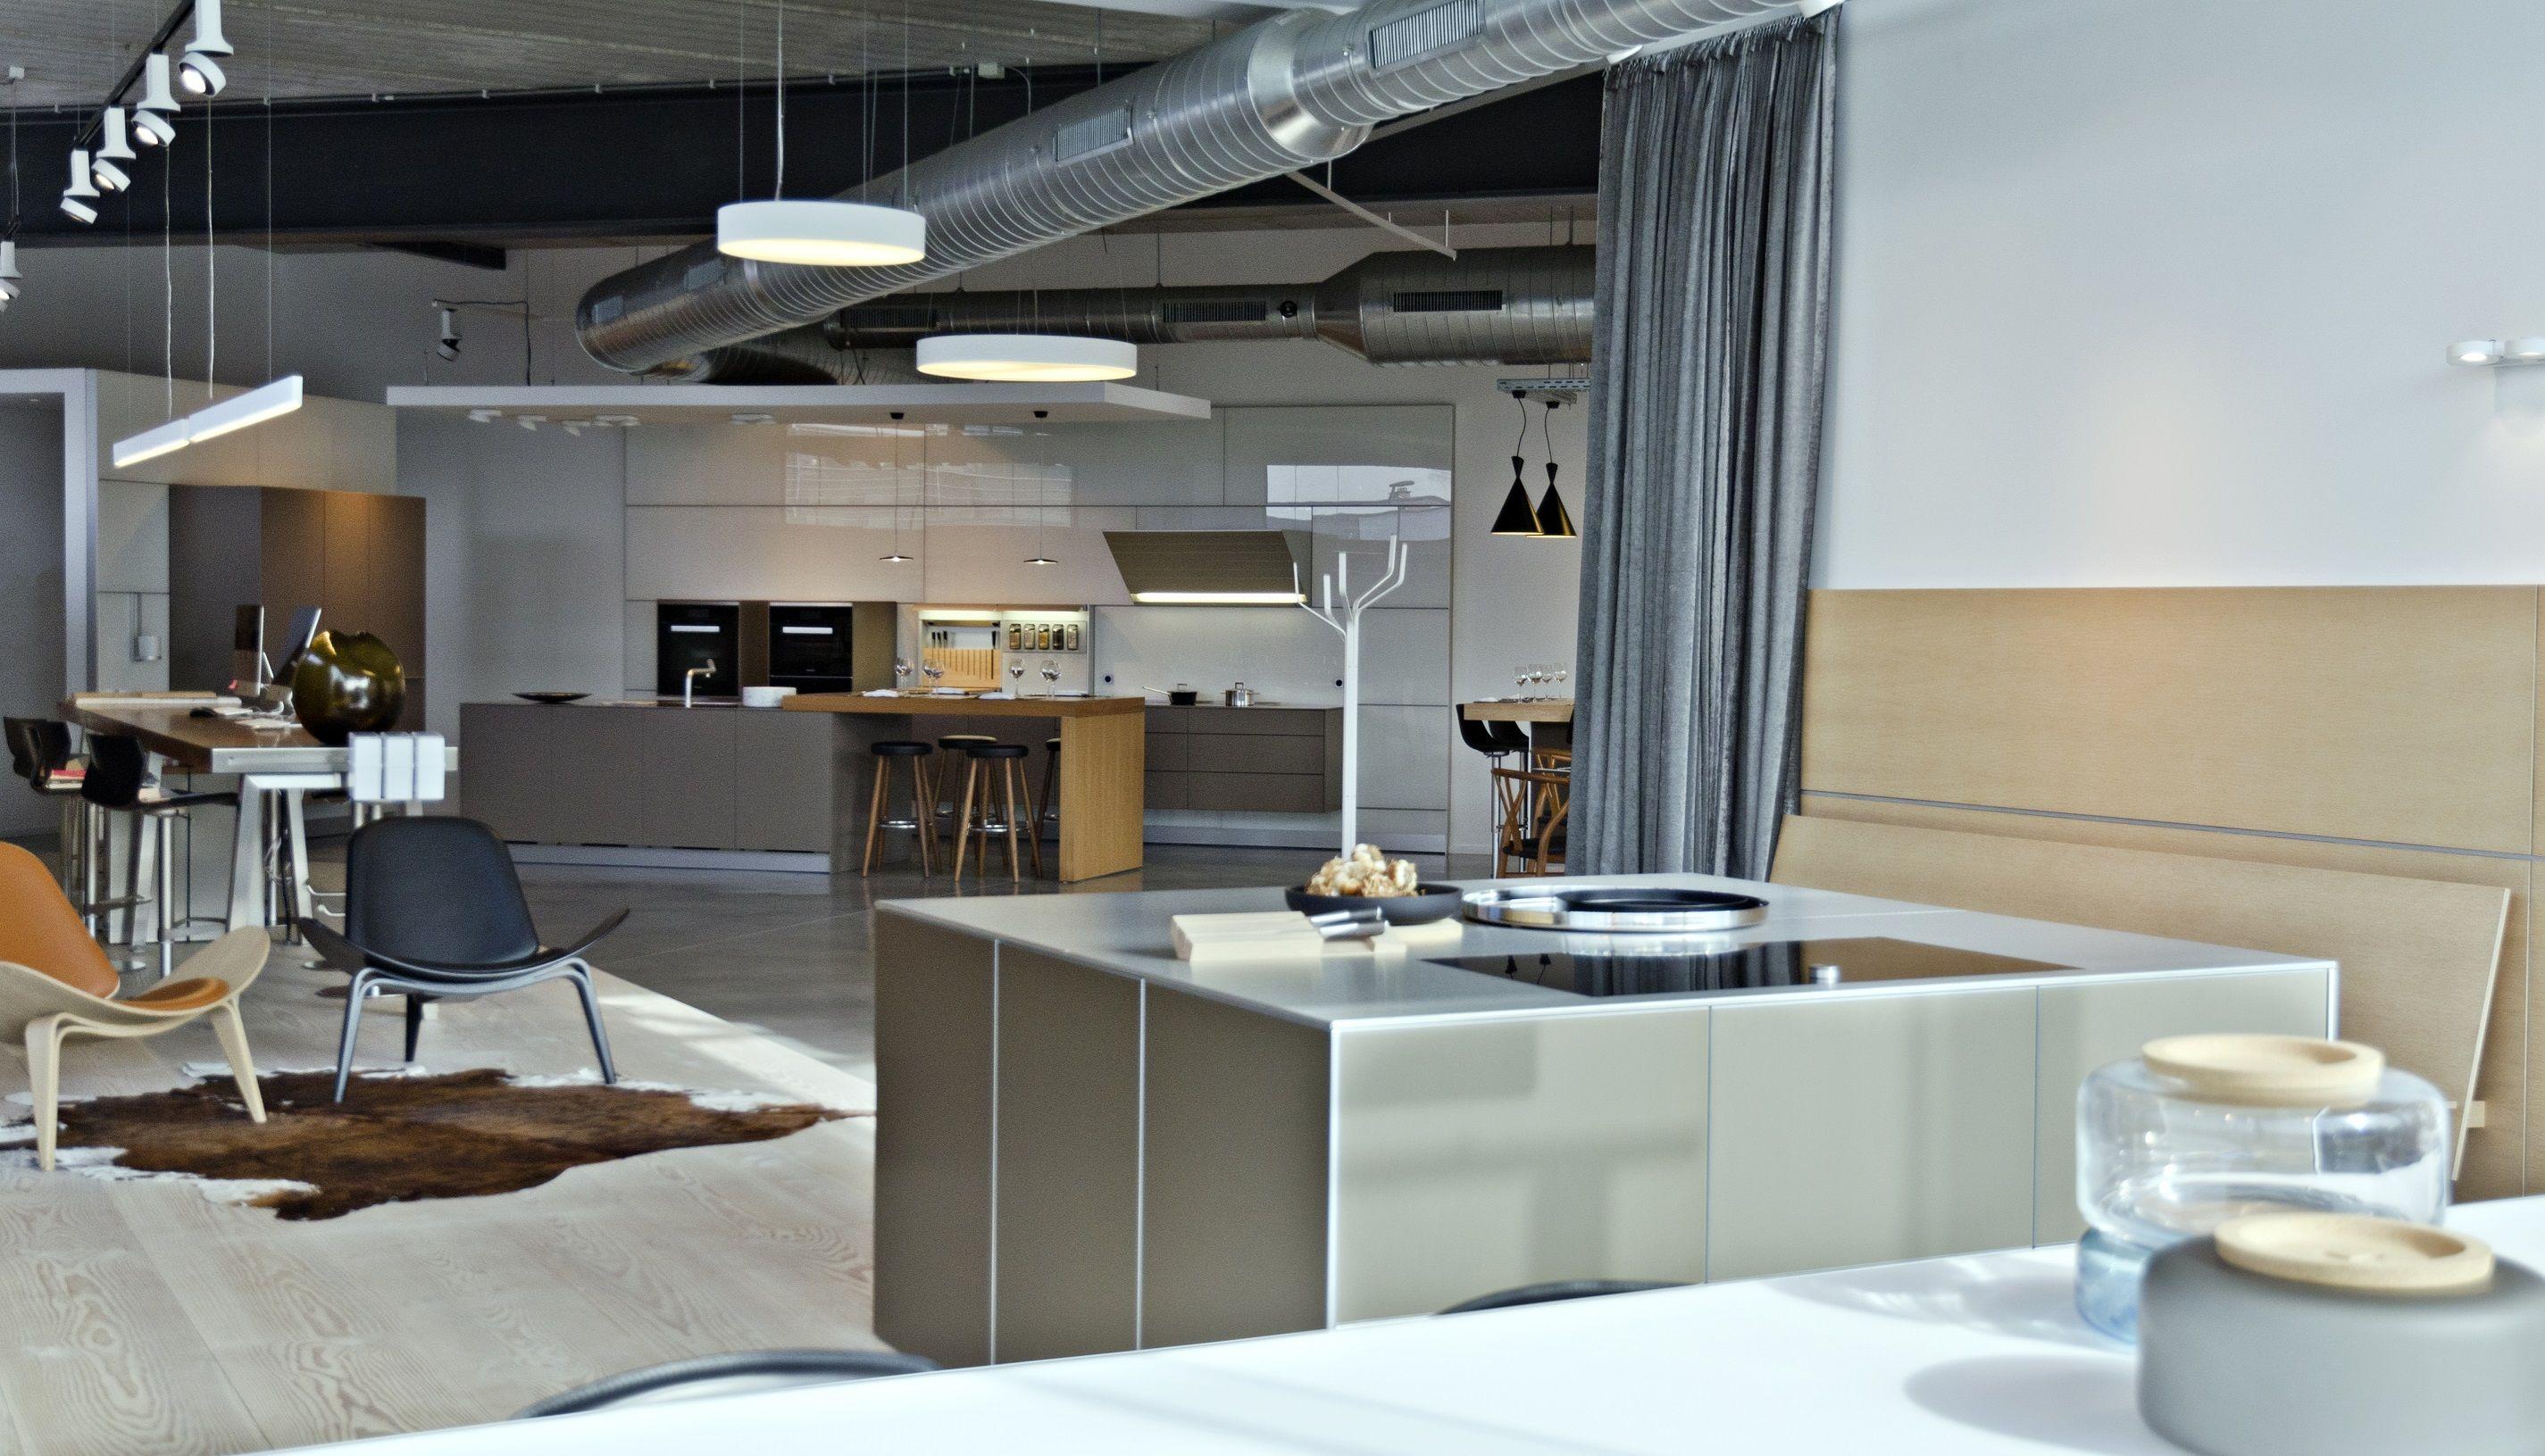 Bulthaup   Showroom Van B Concept In Woluwe/zaventem